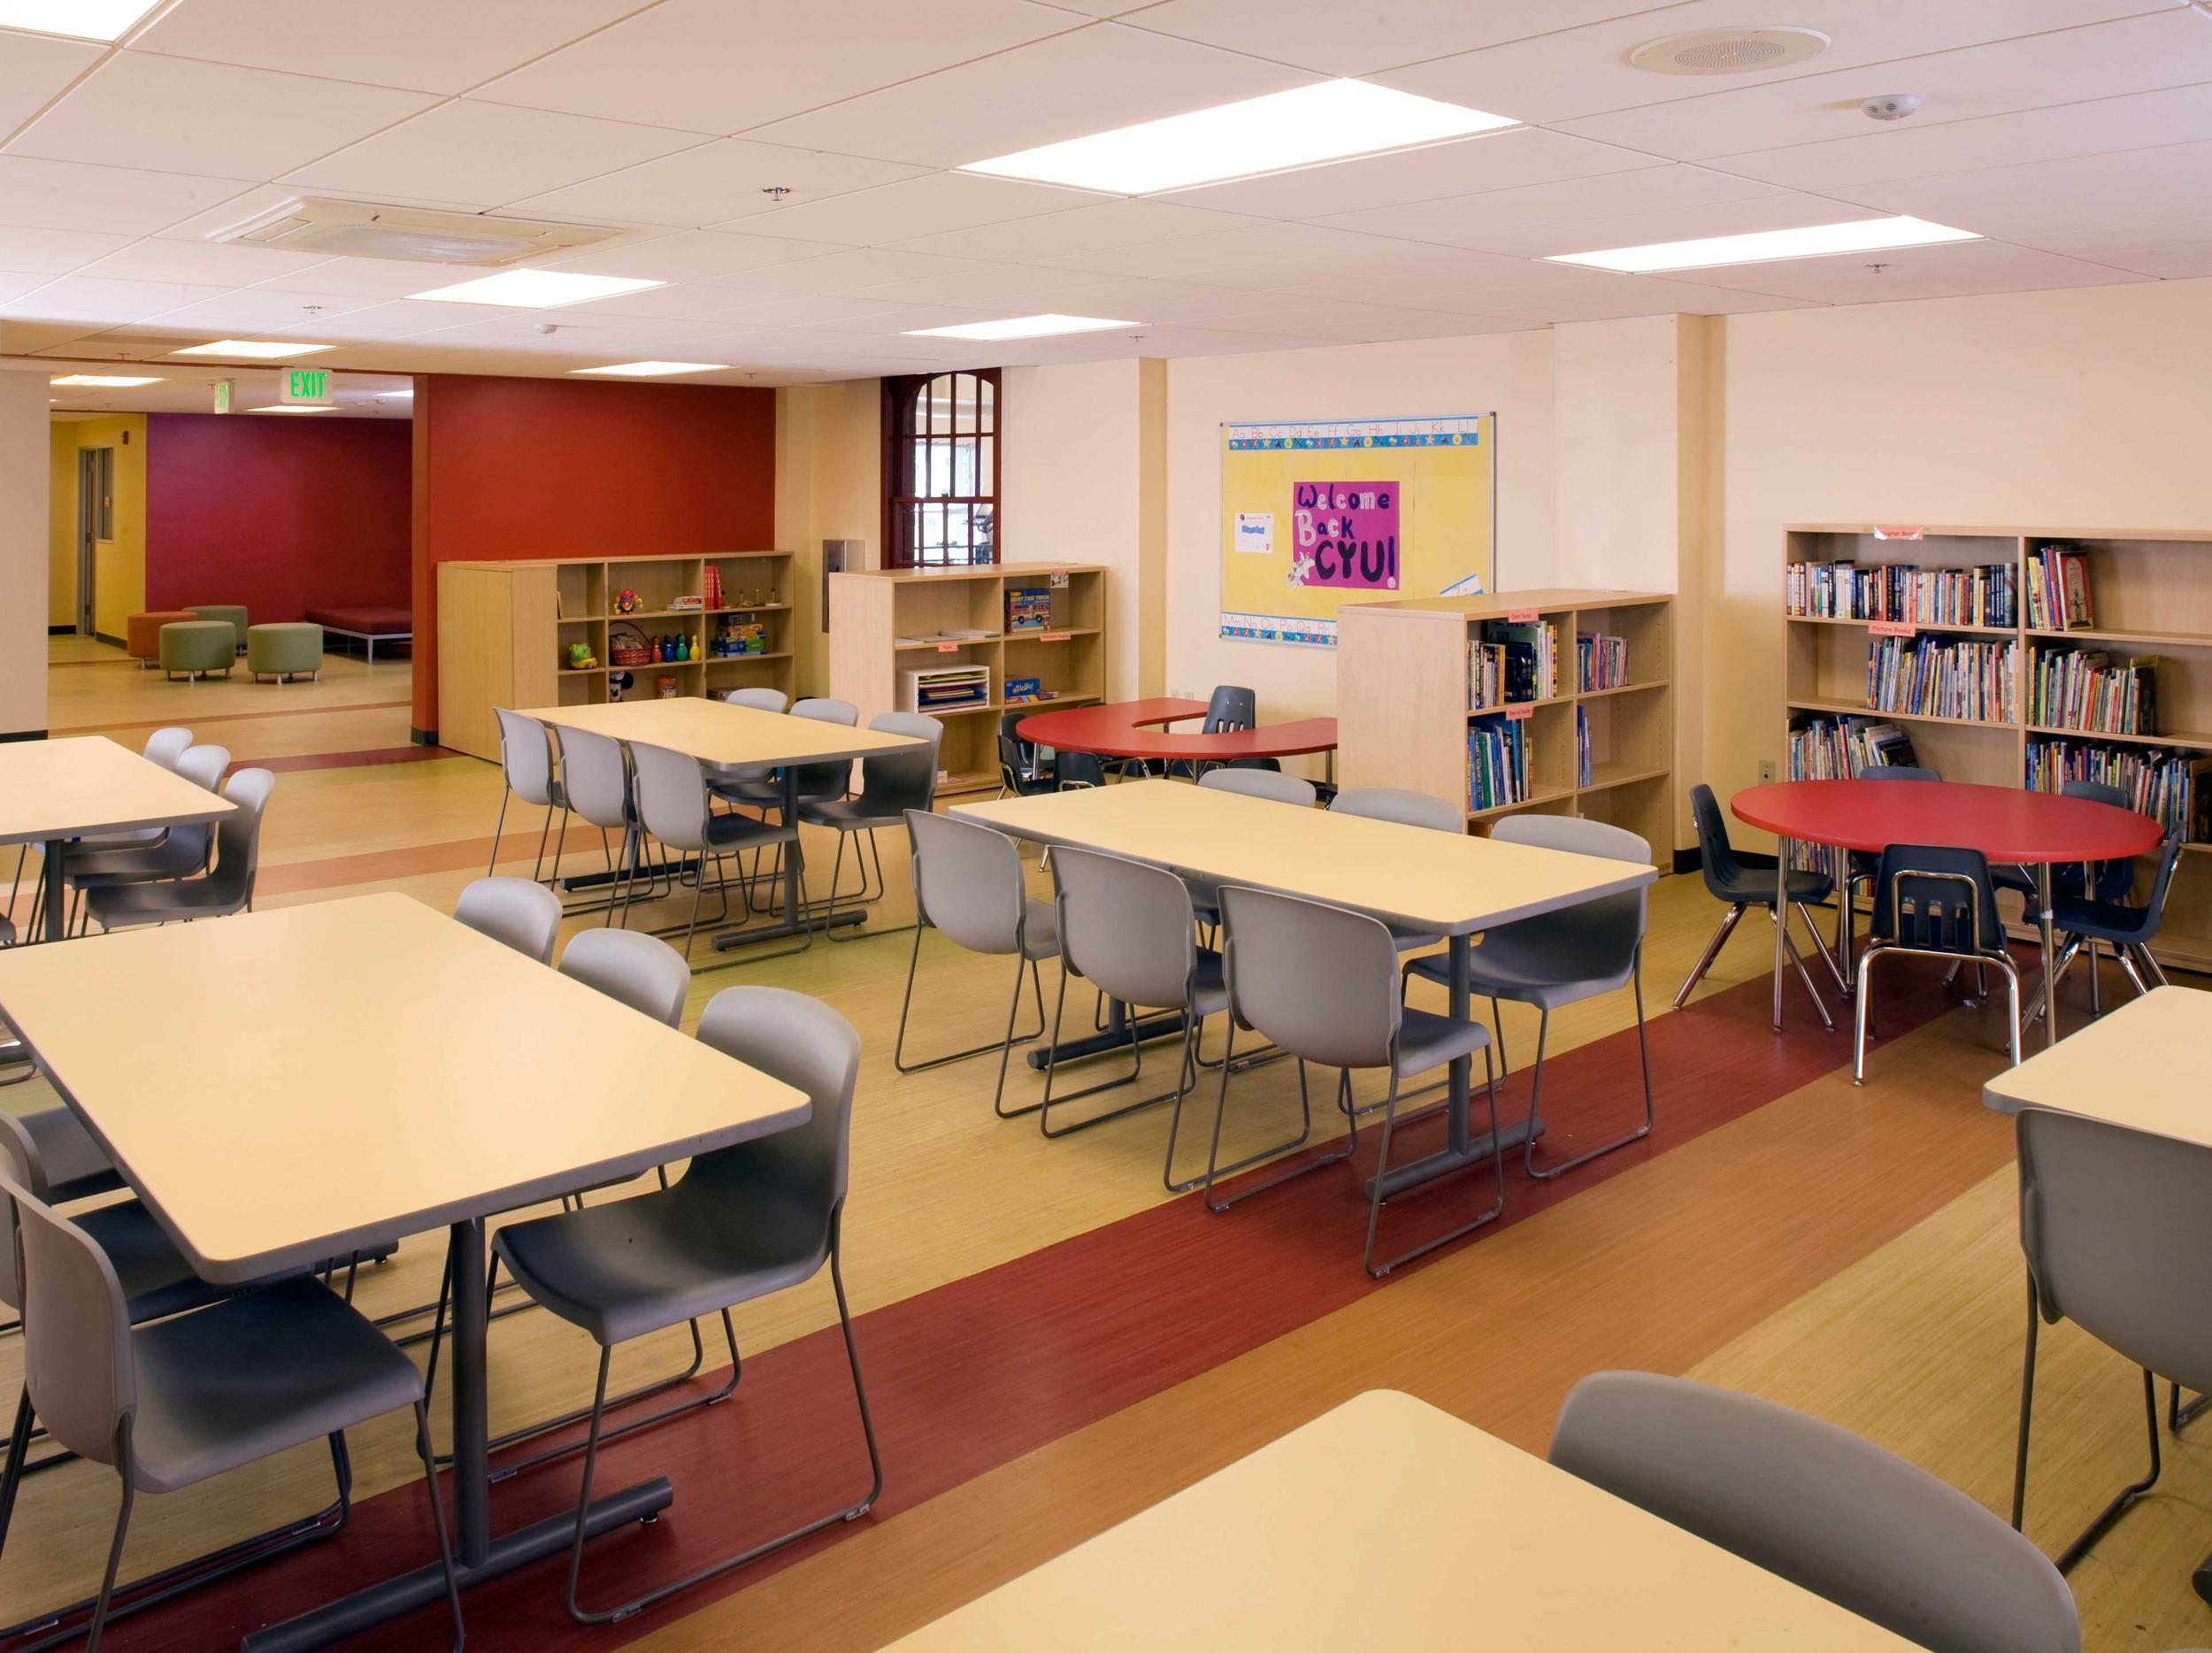 Afterschool Program Classroom